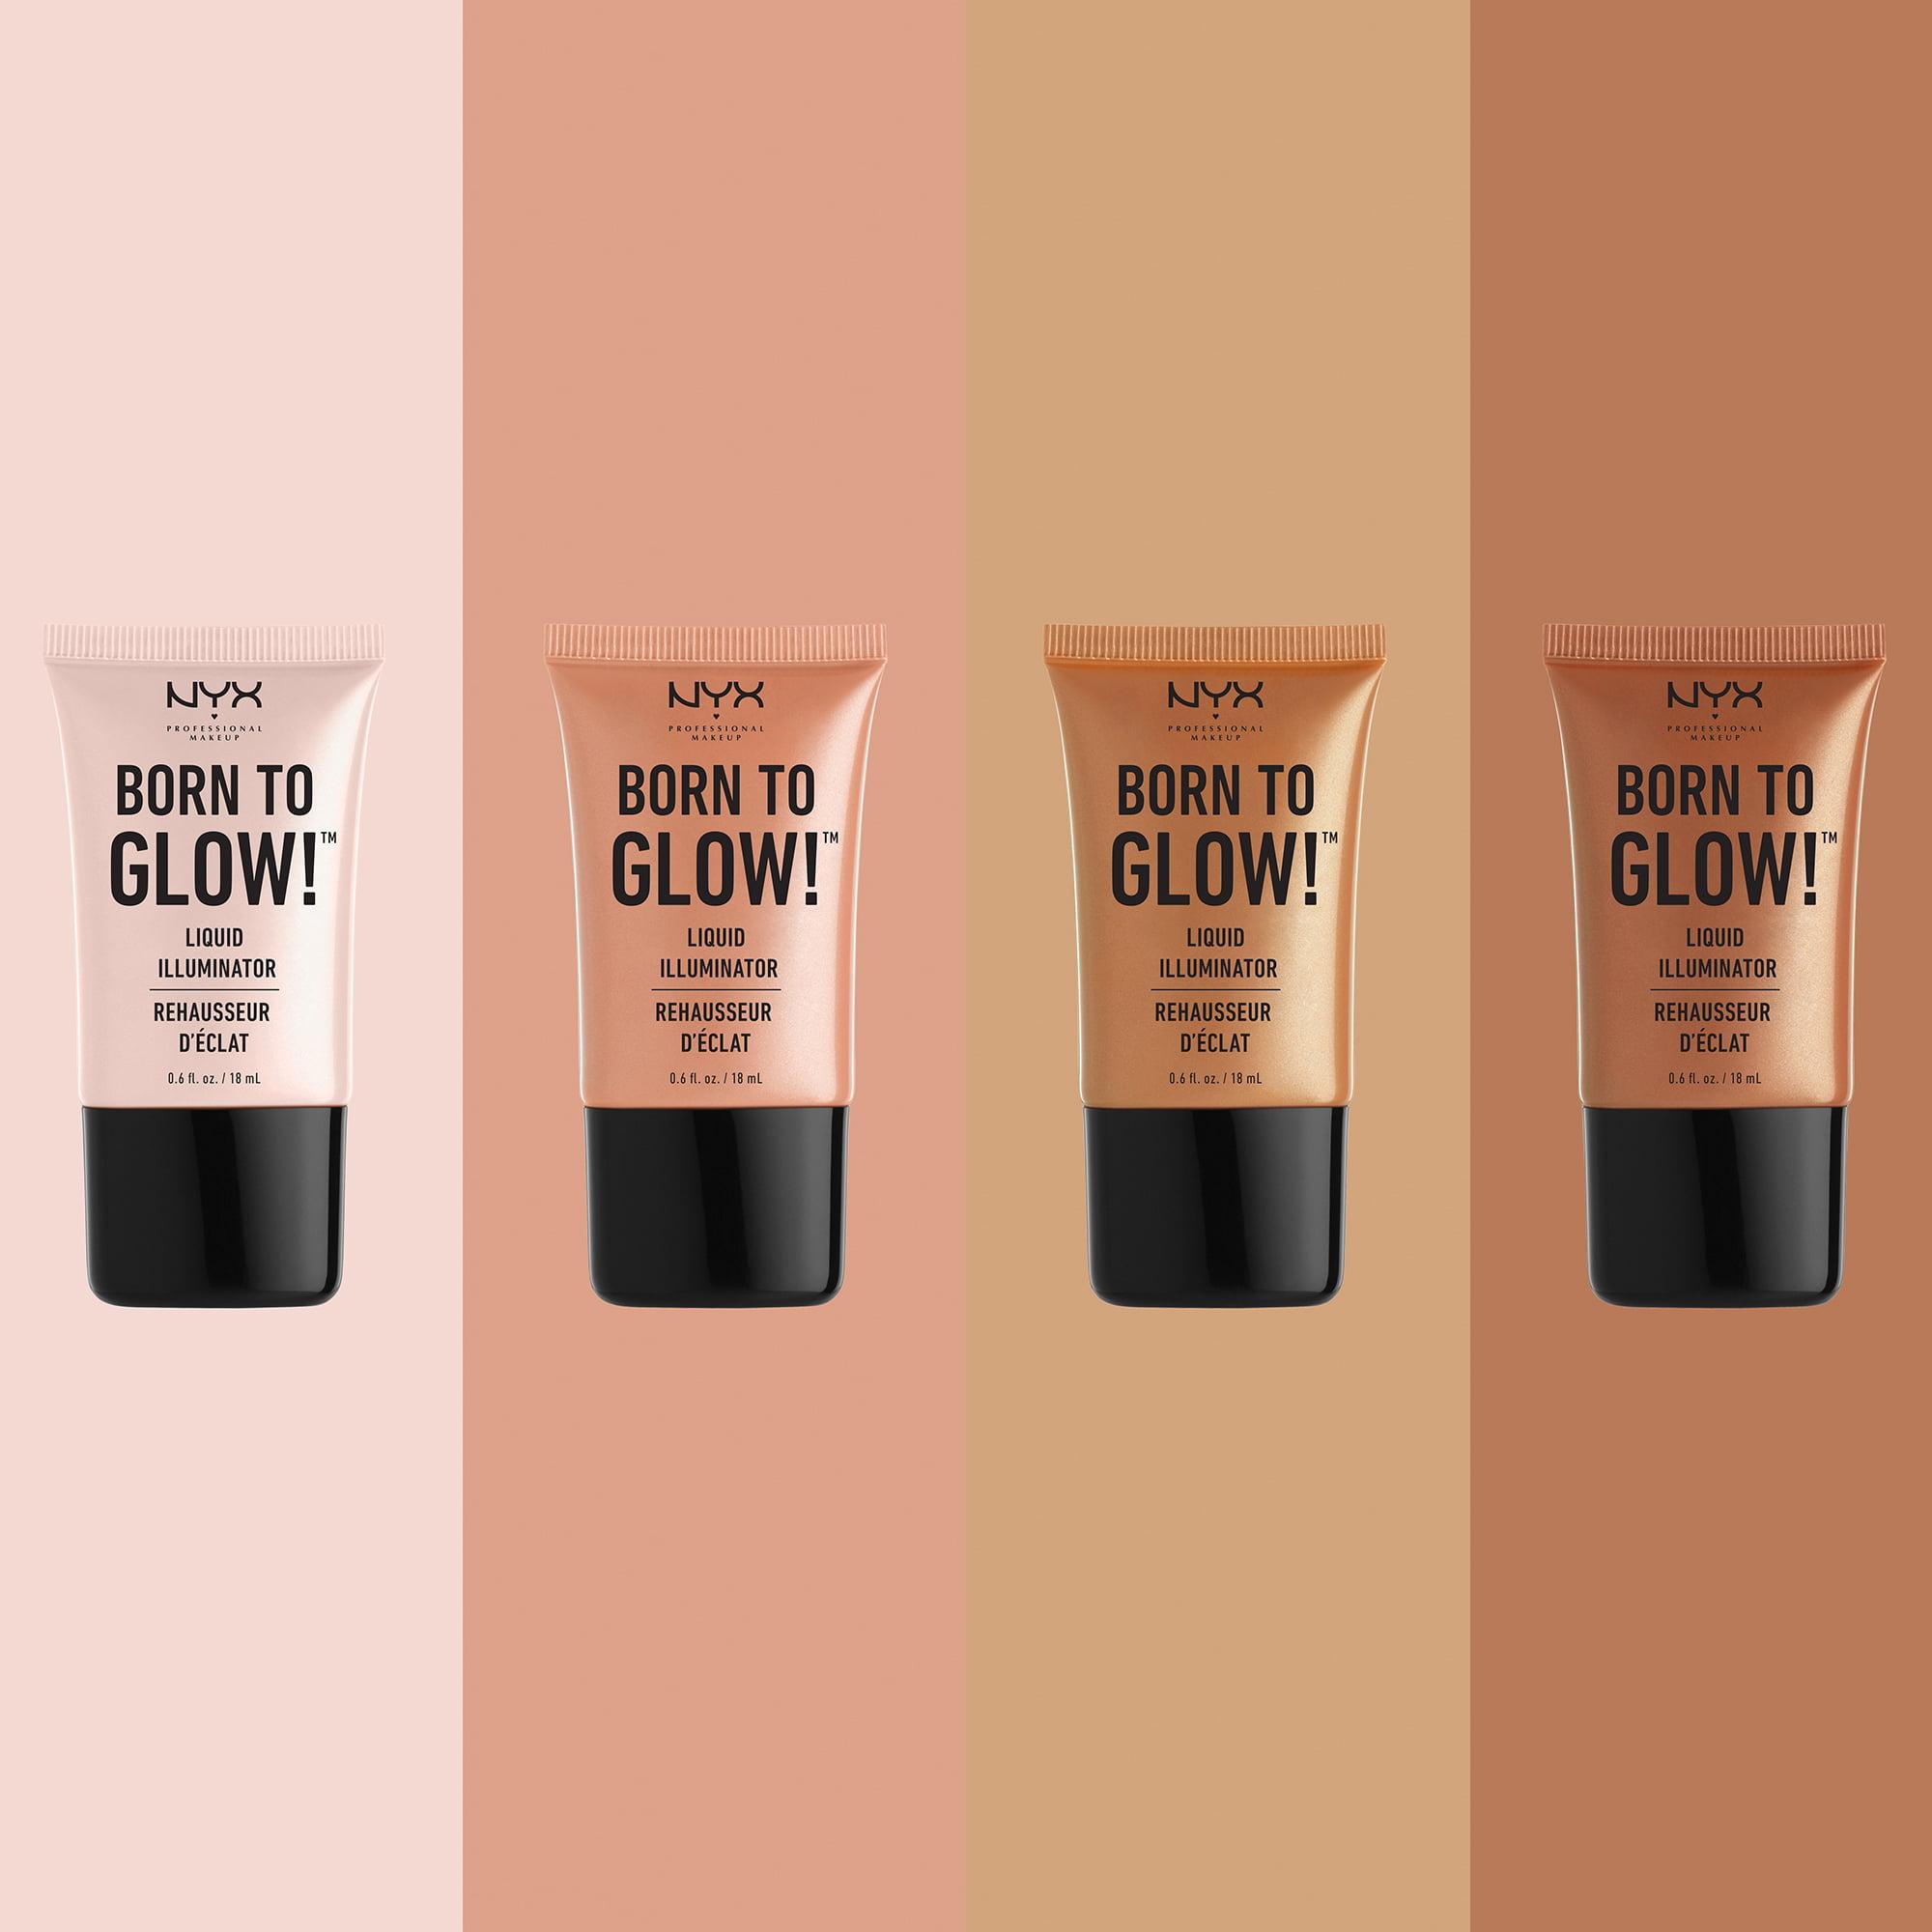 Nyx Professional Makeup Born To Glow Liquid Illuminator Gleam Walmart Com Walmart Com